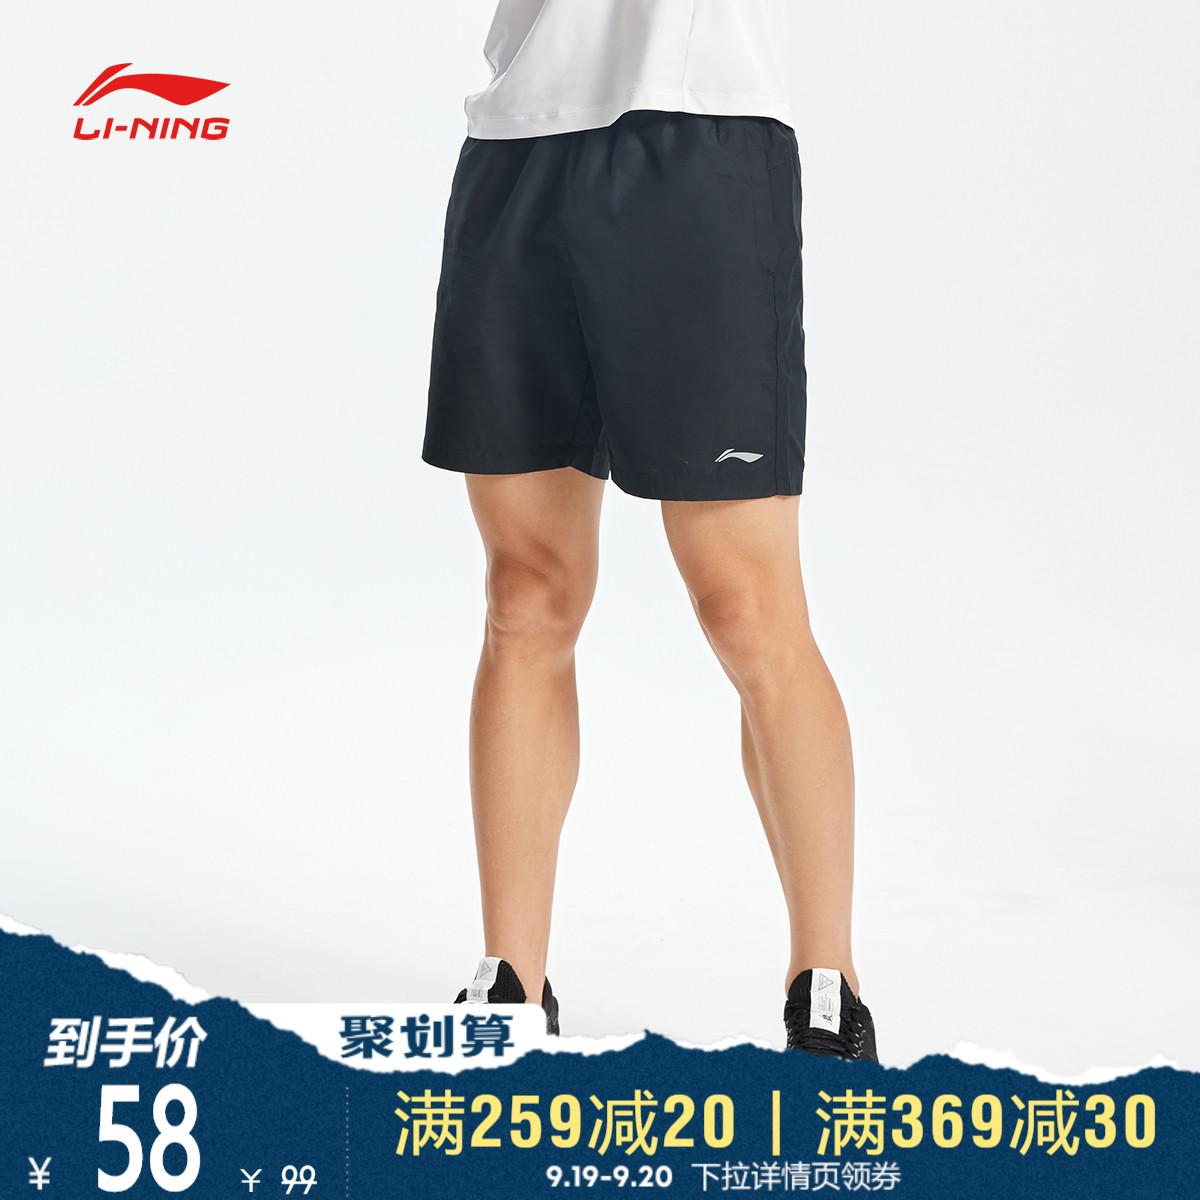 Мужские спортивные штаны / Шорты Артикул 564193284243